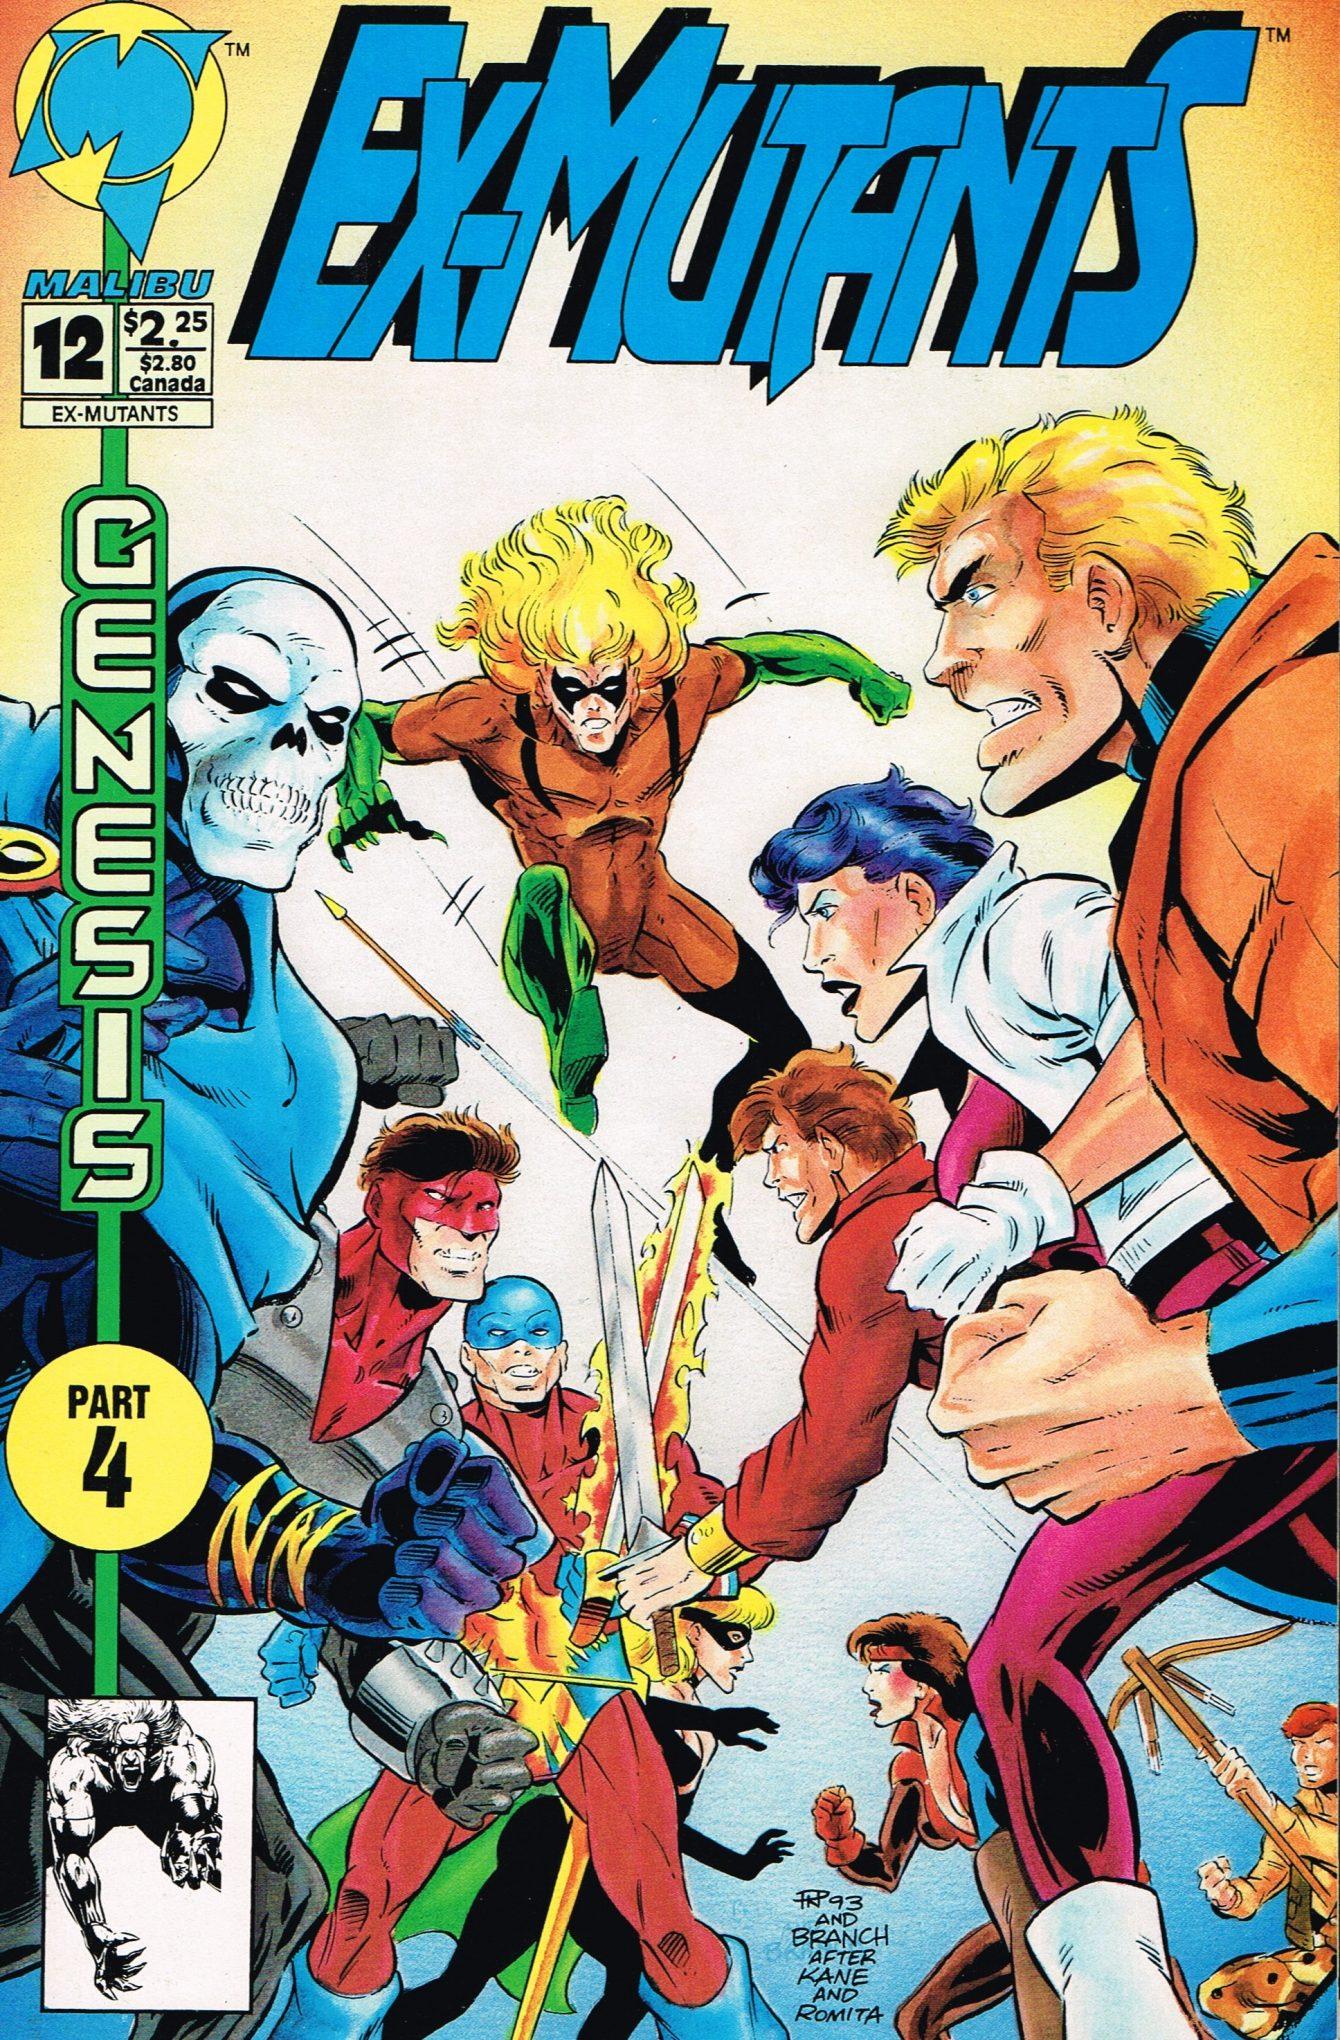 Ex-Mutants #12